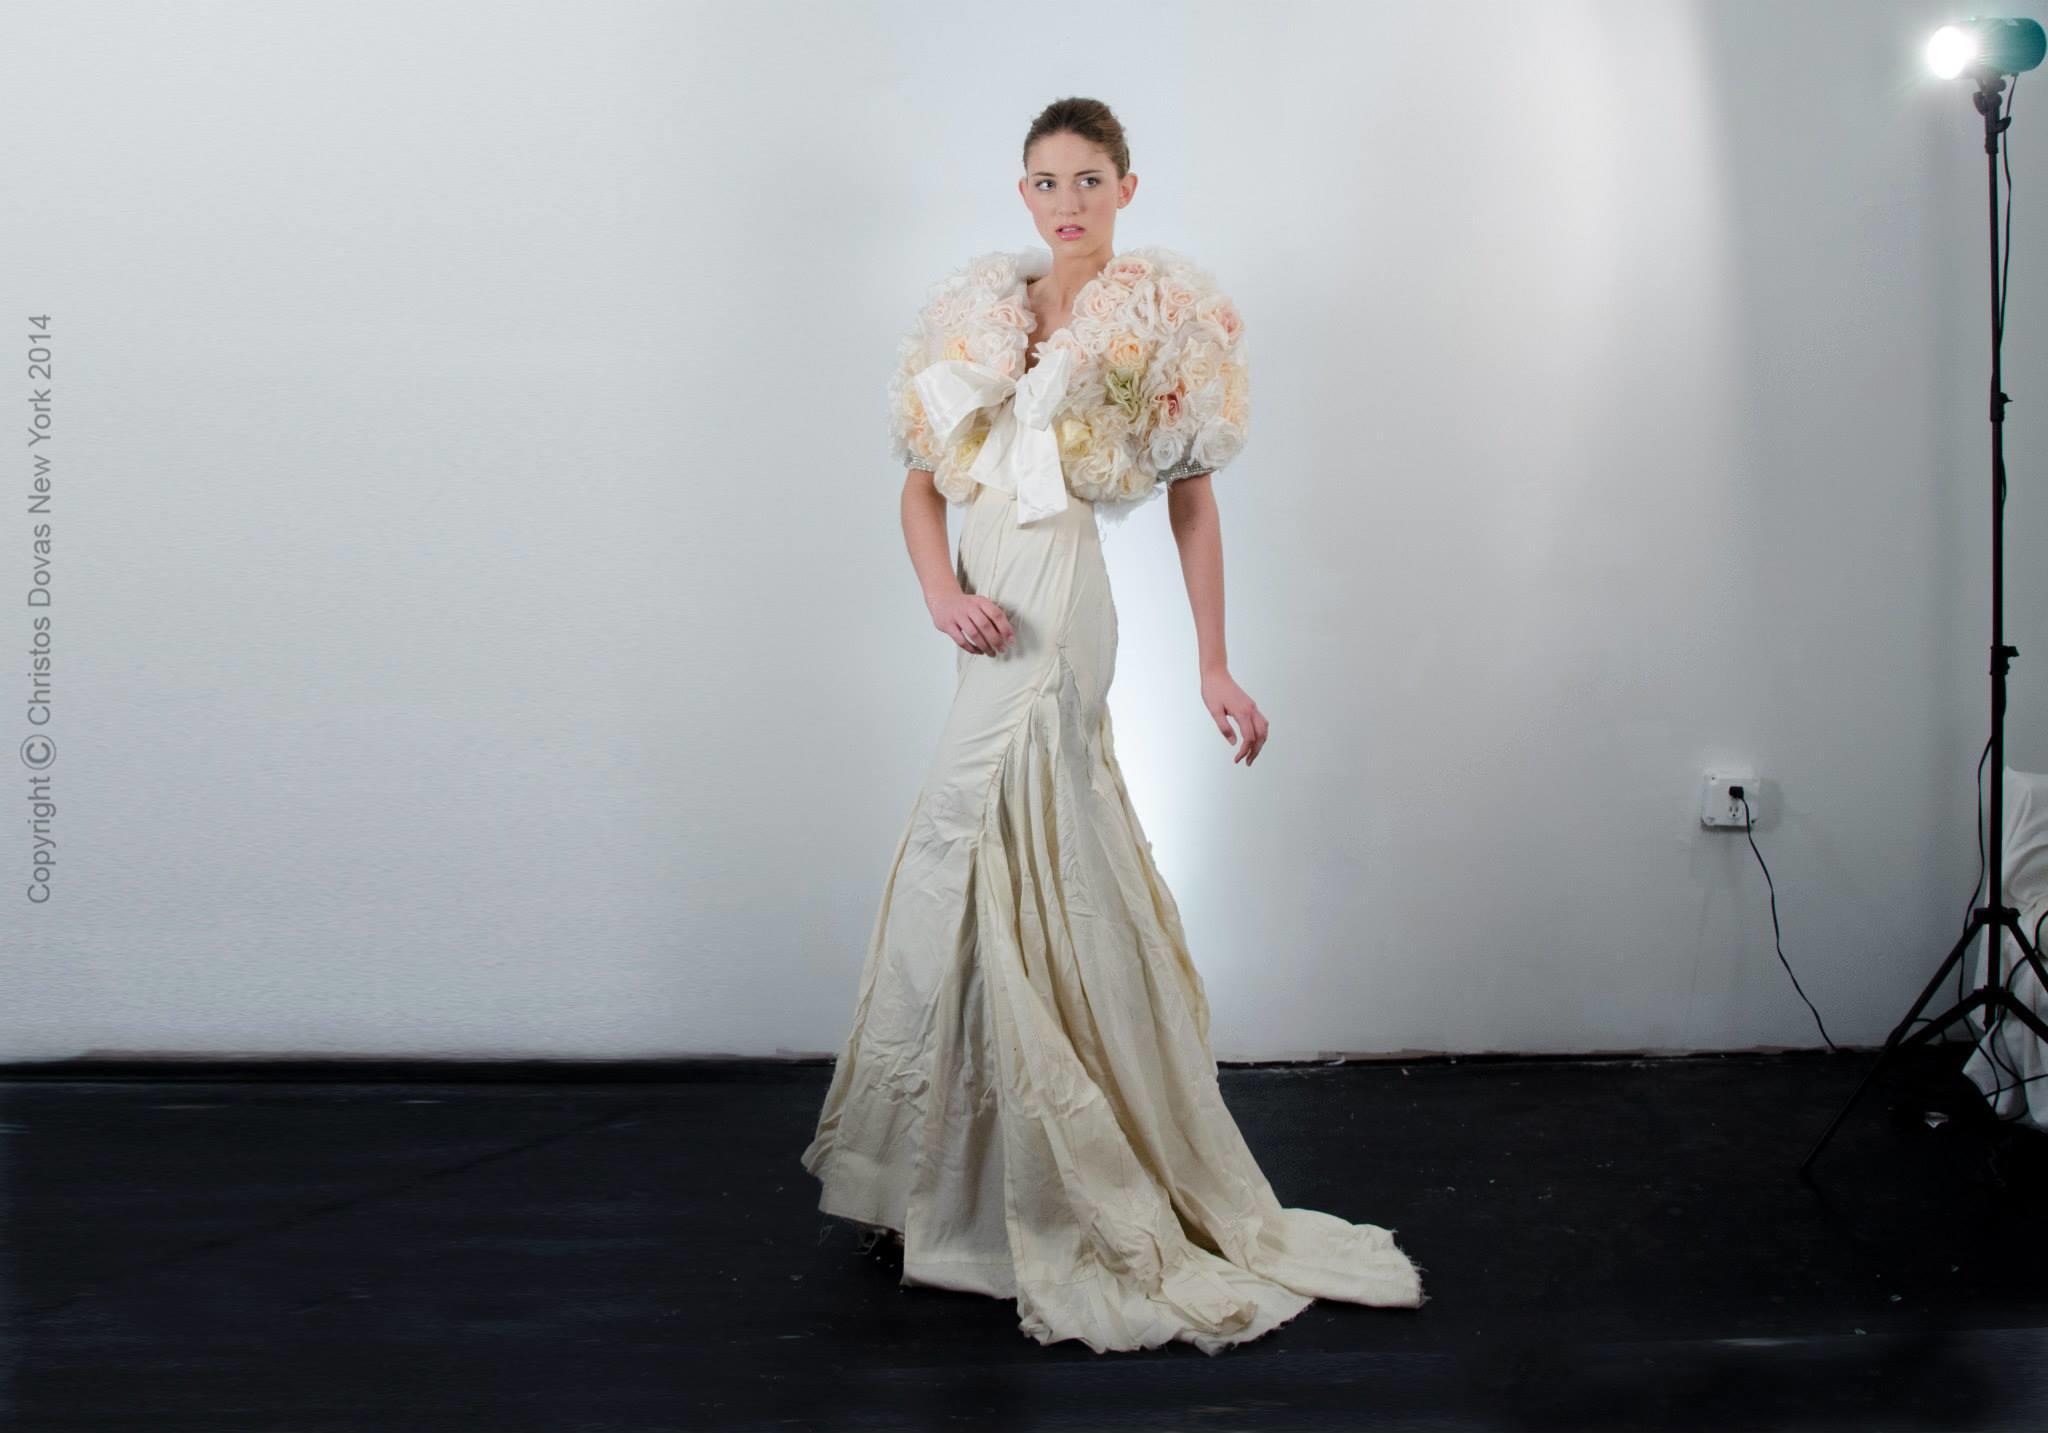 Wedding Dress Ping Nyc Yelp : Christos dovas new york ny company information